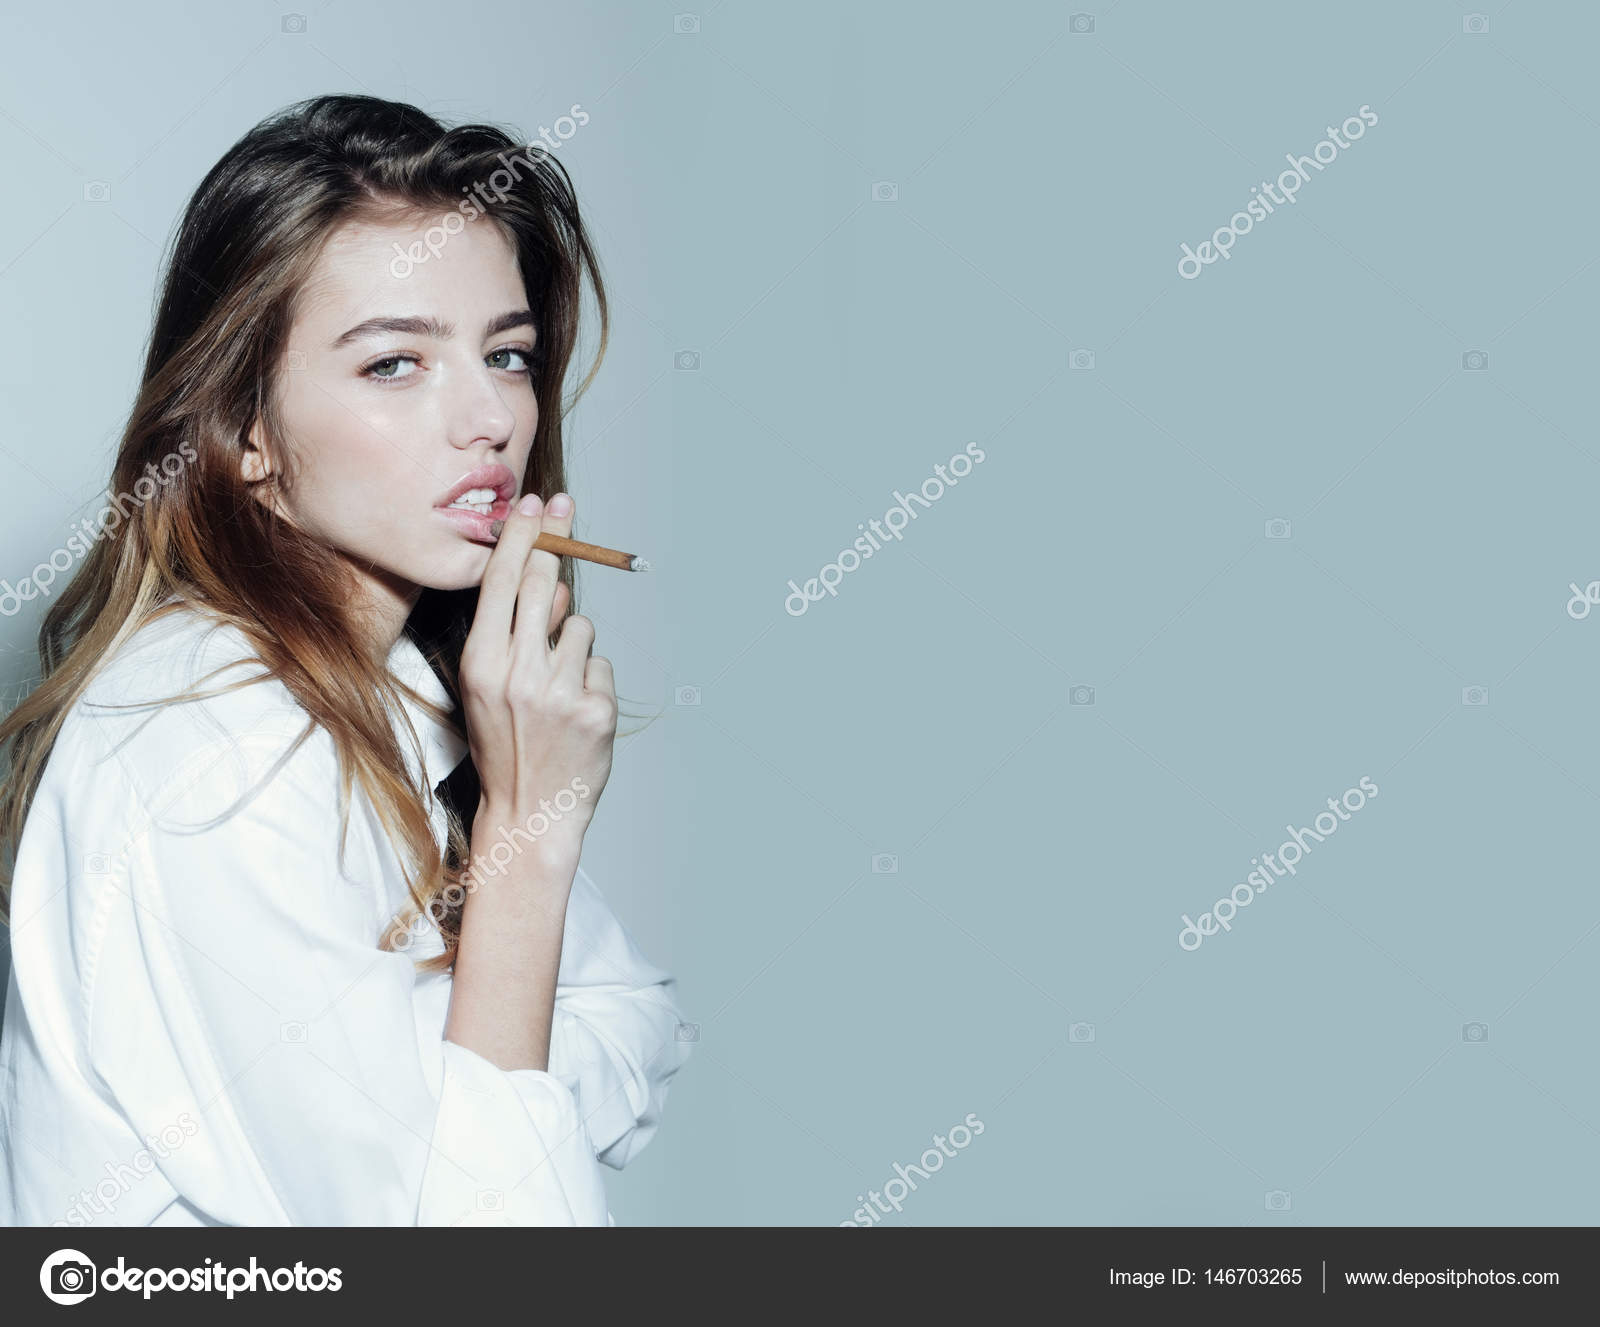 Young blonde teen smoking cigarette